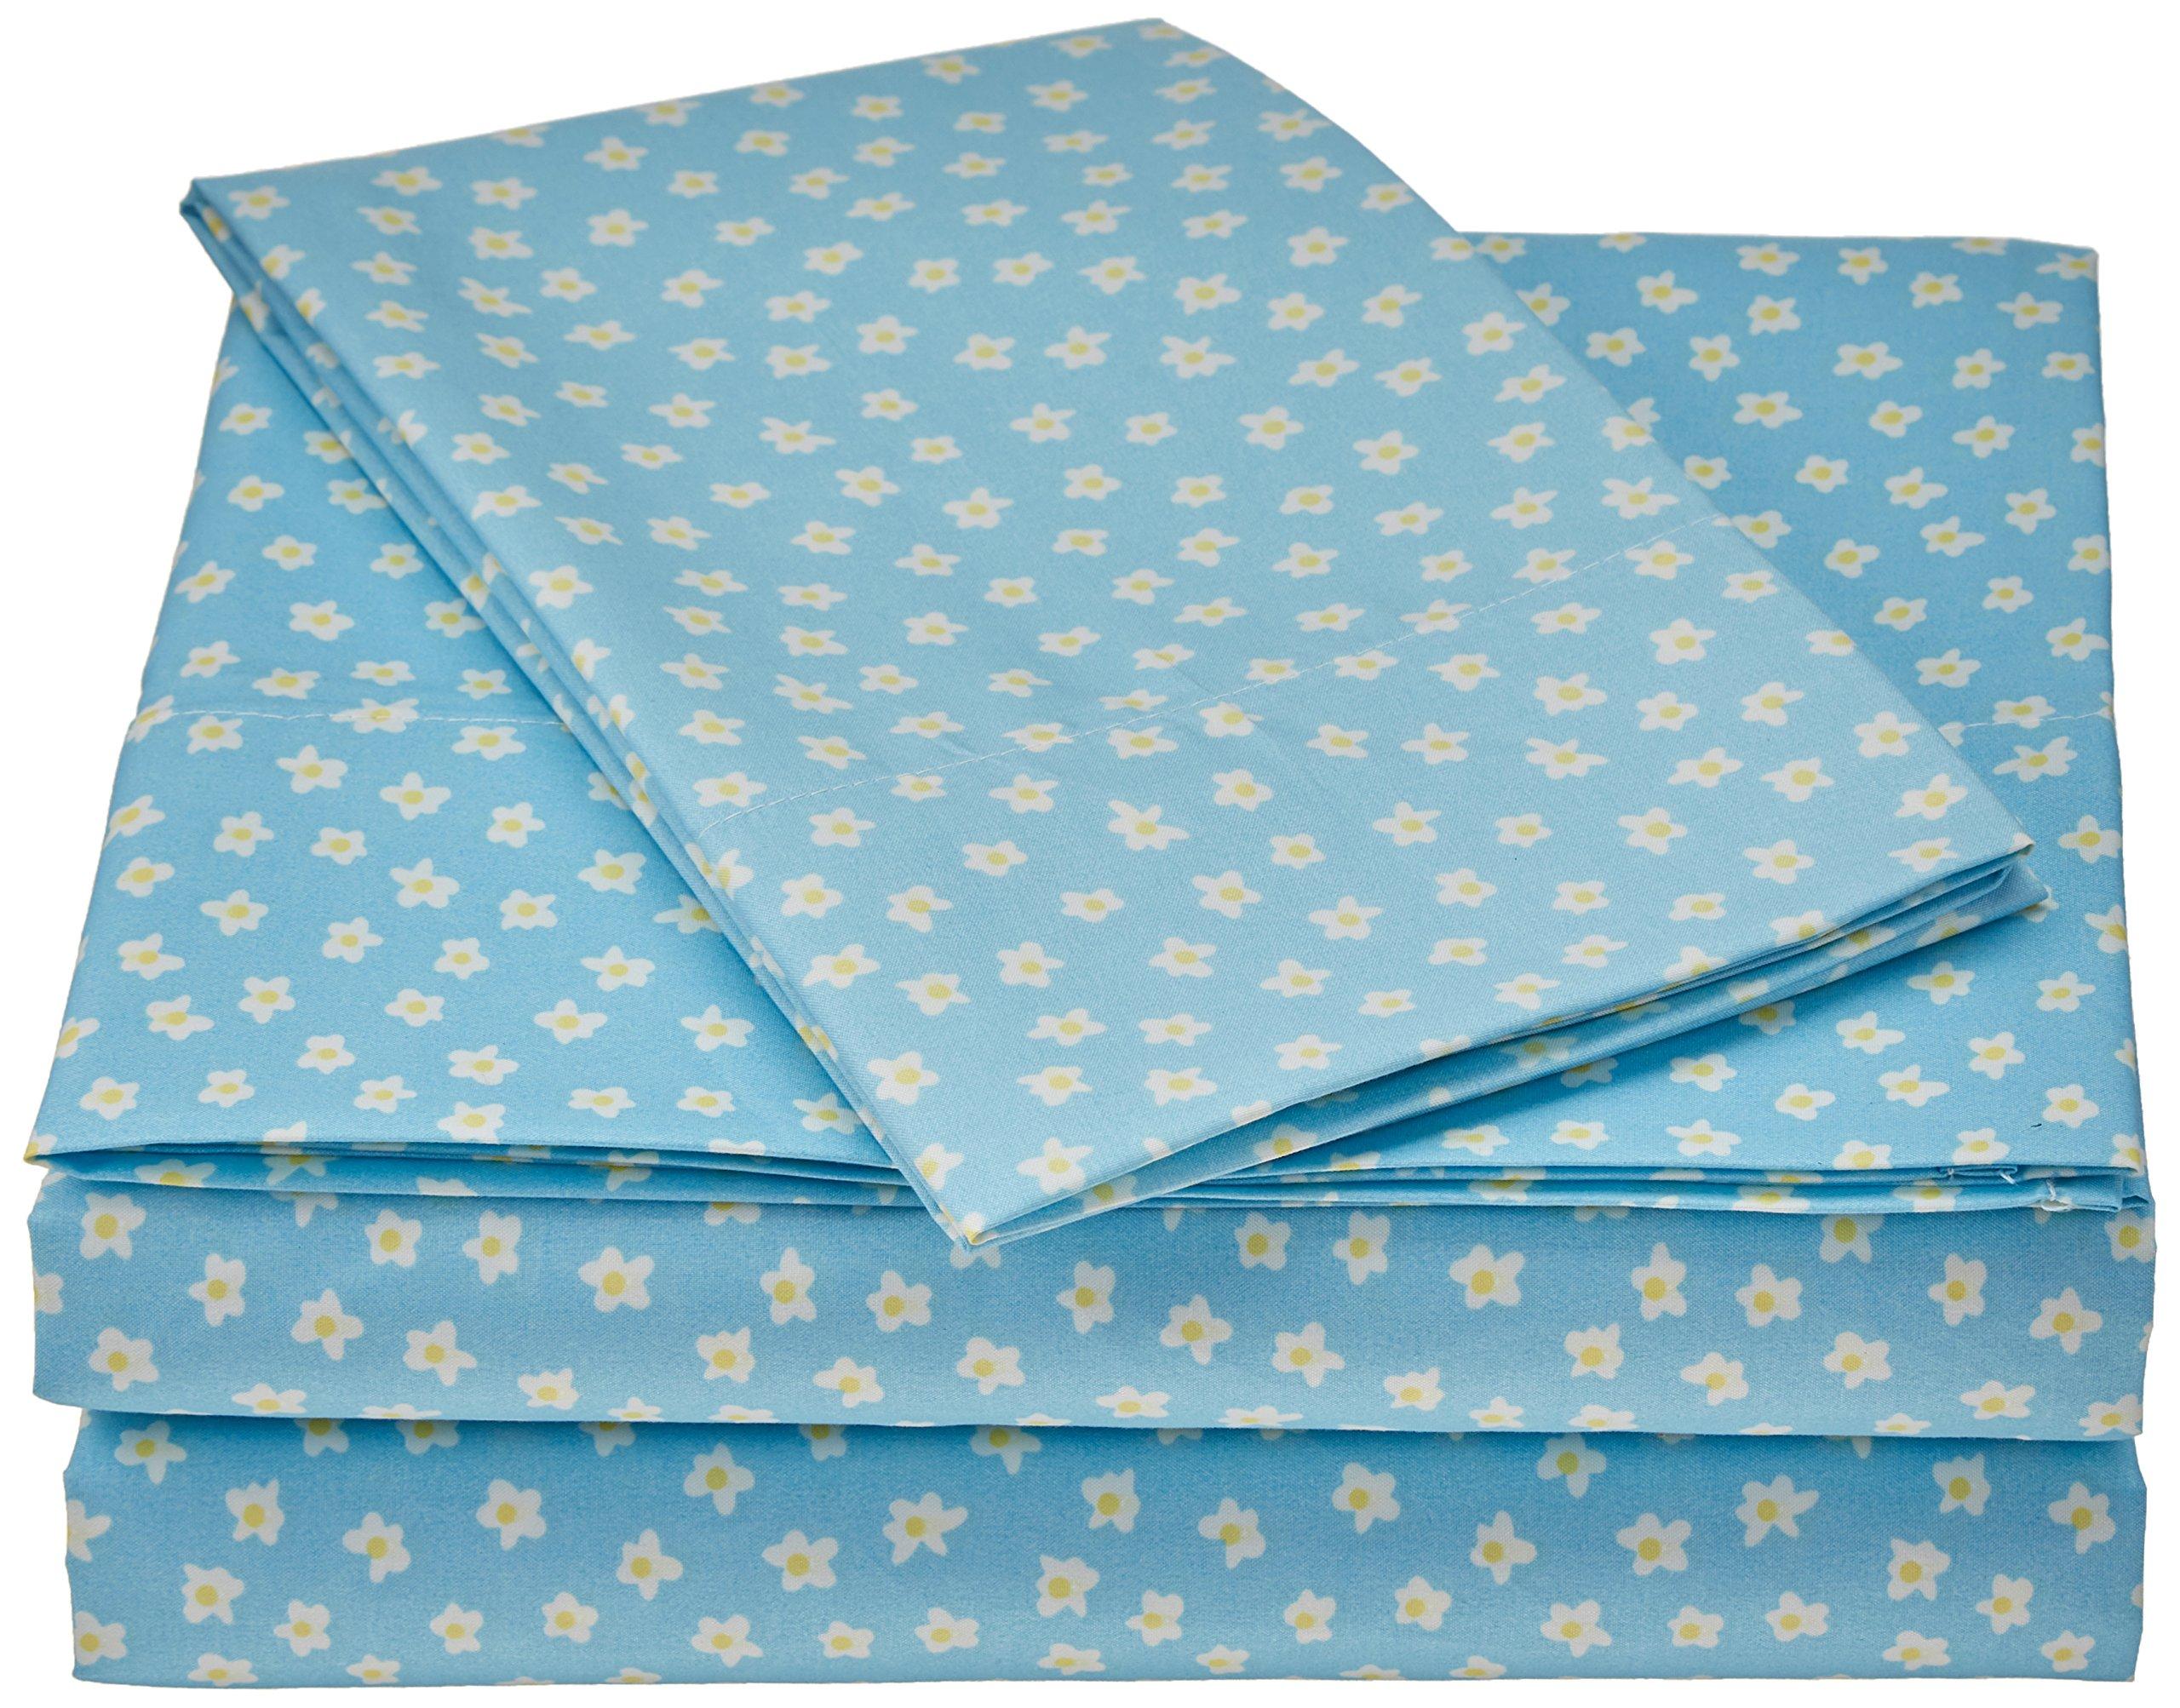 Laura Hart Kids SS2352TW-4700 Printed Sheet Set, Twin, Garden Fairies Daisies